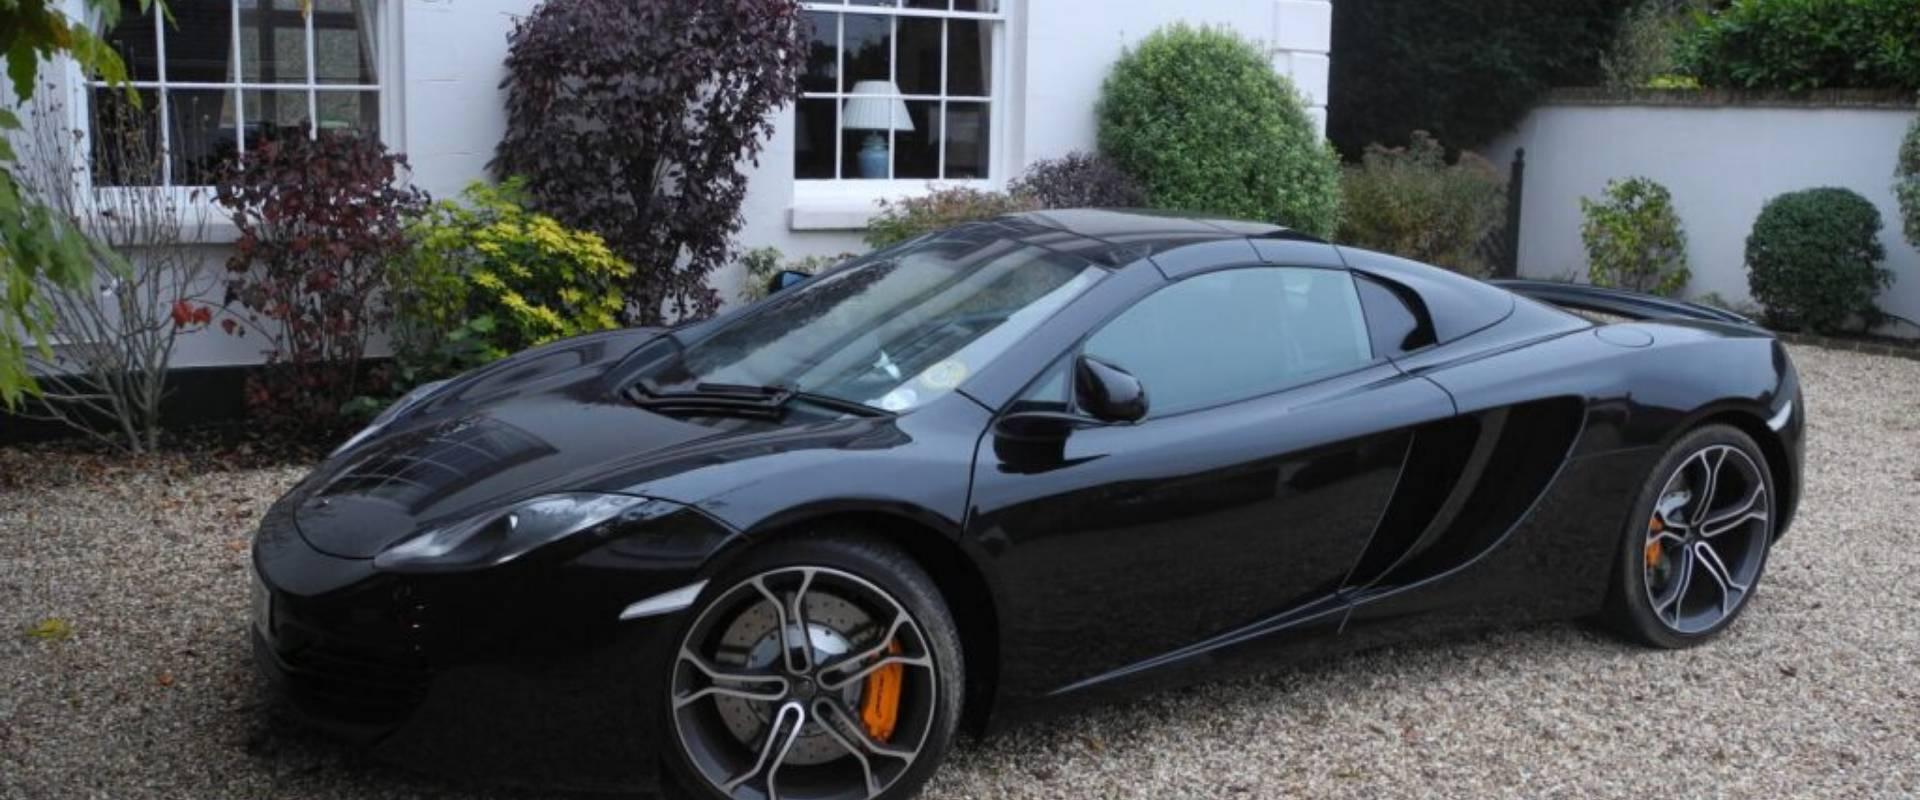 McLaren 12C Spider – Ownership Report 1st 6 Months